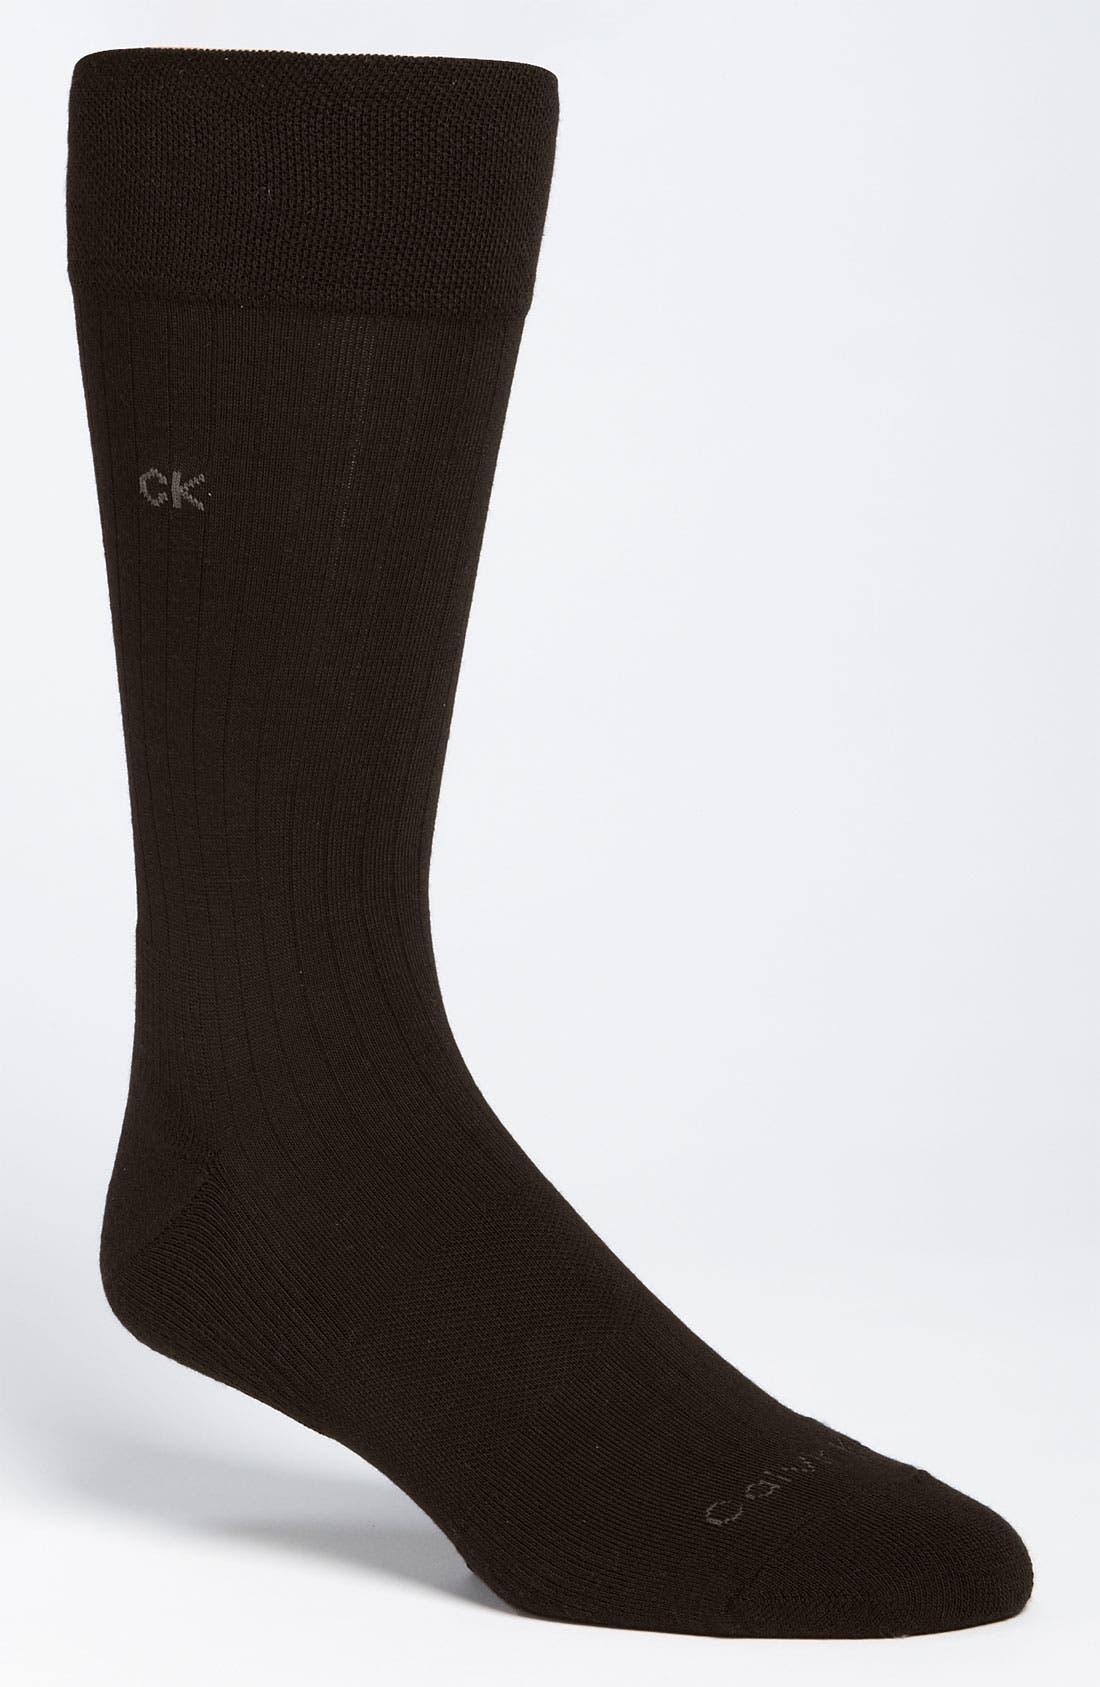 Main Image - Calvin Klein 'Ultra Fit' Socks